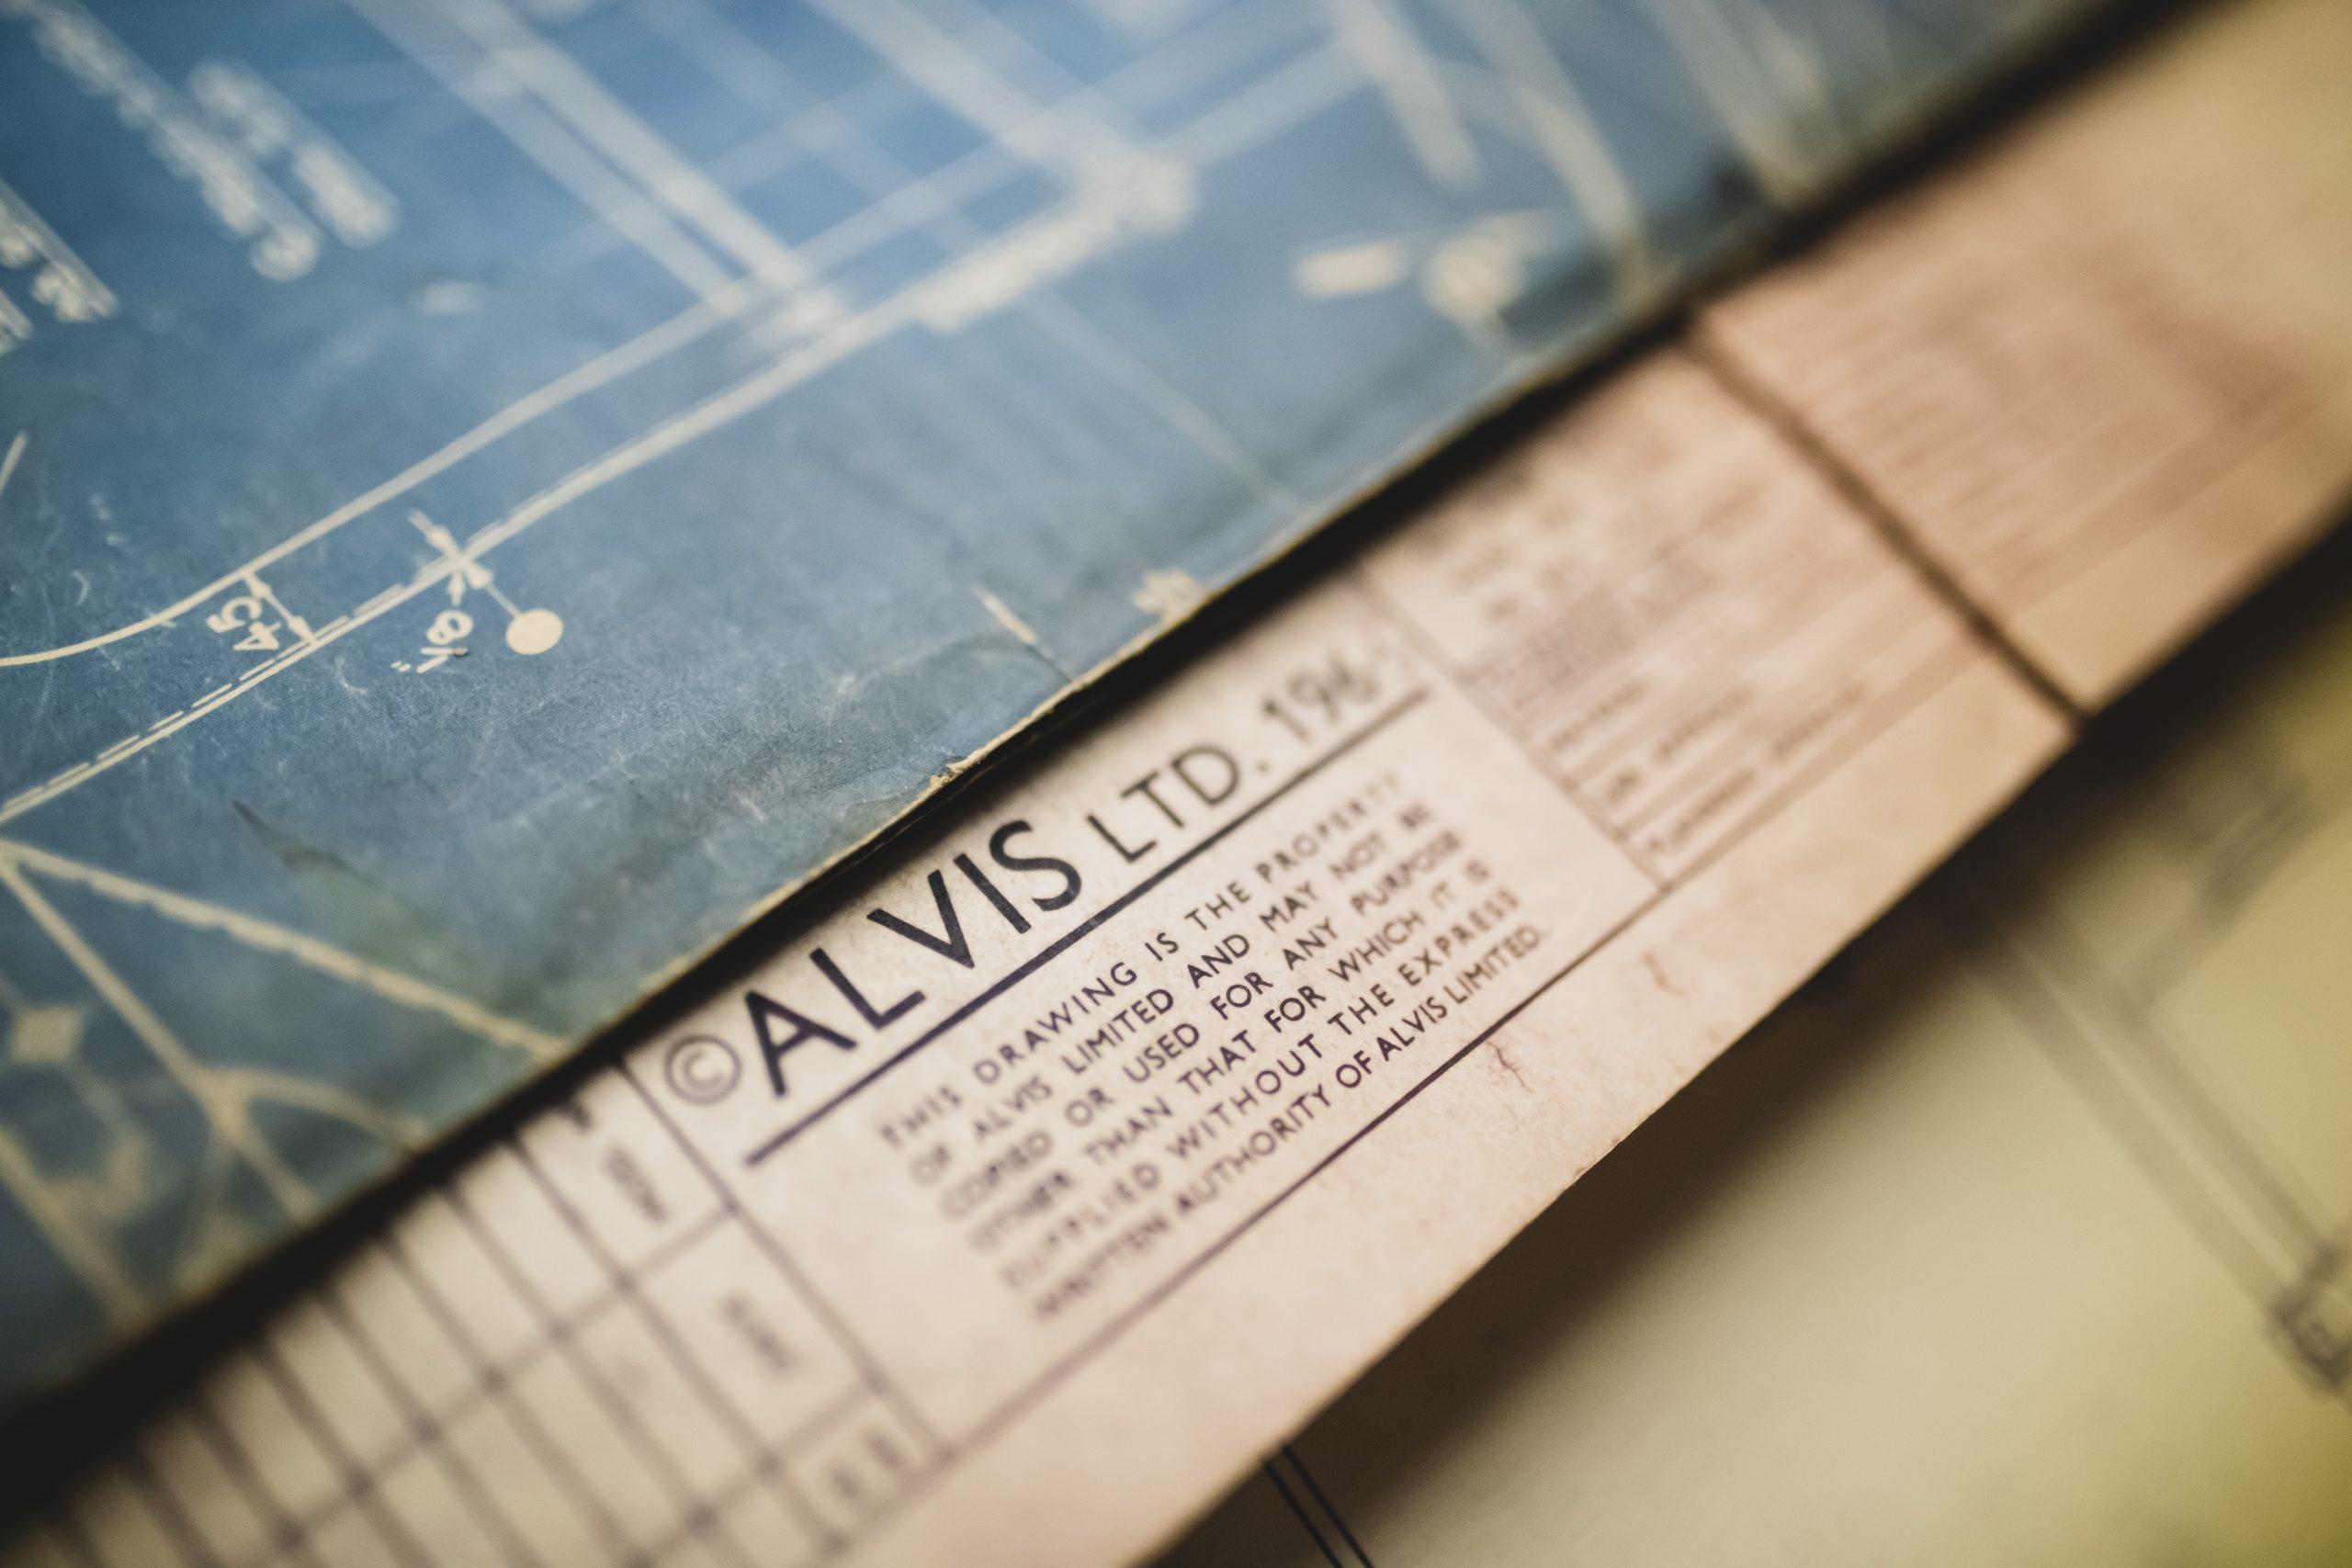 alvis vintage car drawings drafts close